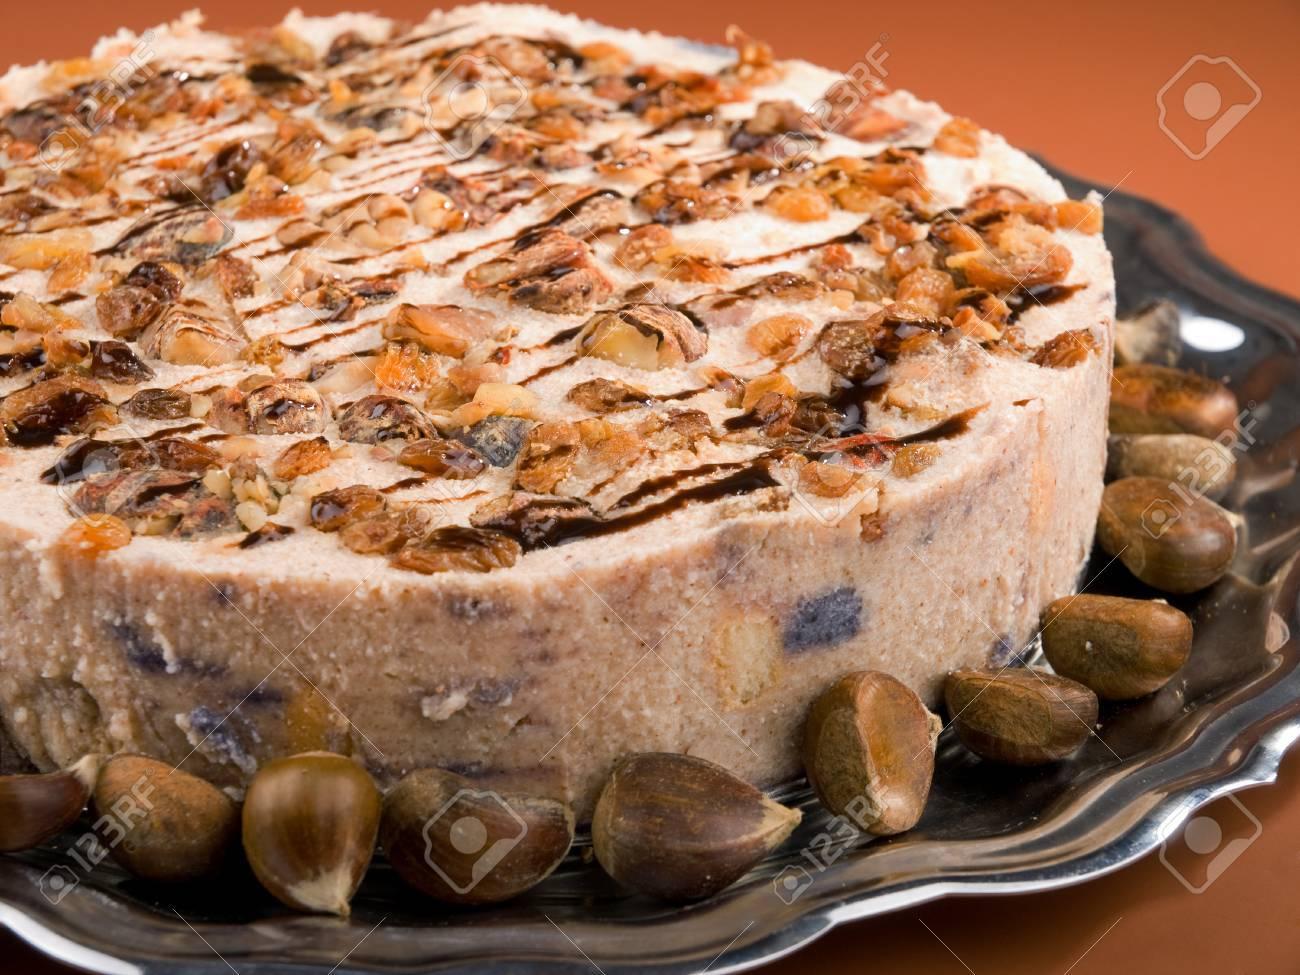 Chestnut and raisins tiramisu - prepared like standard tiramisu with the addition of pureed boiled chestnuts and raisins to the cream - 62251963